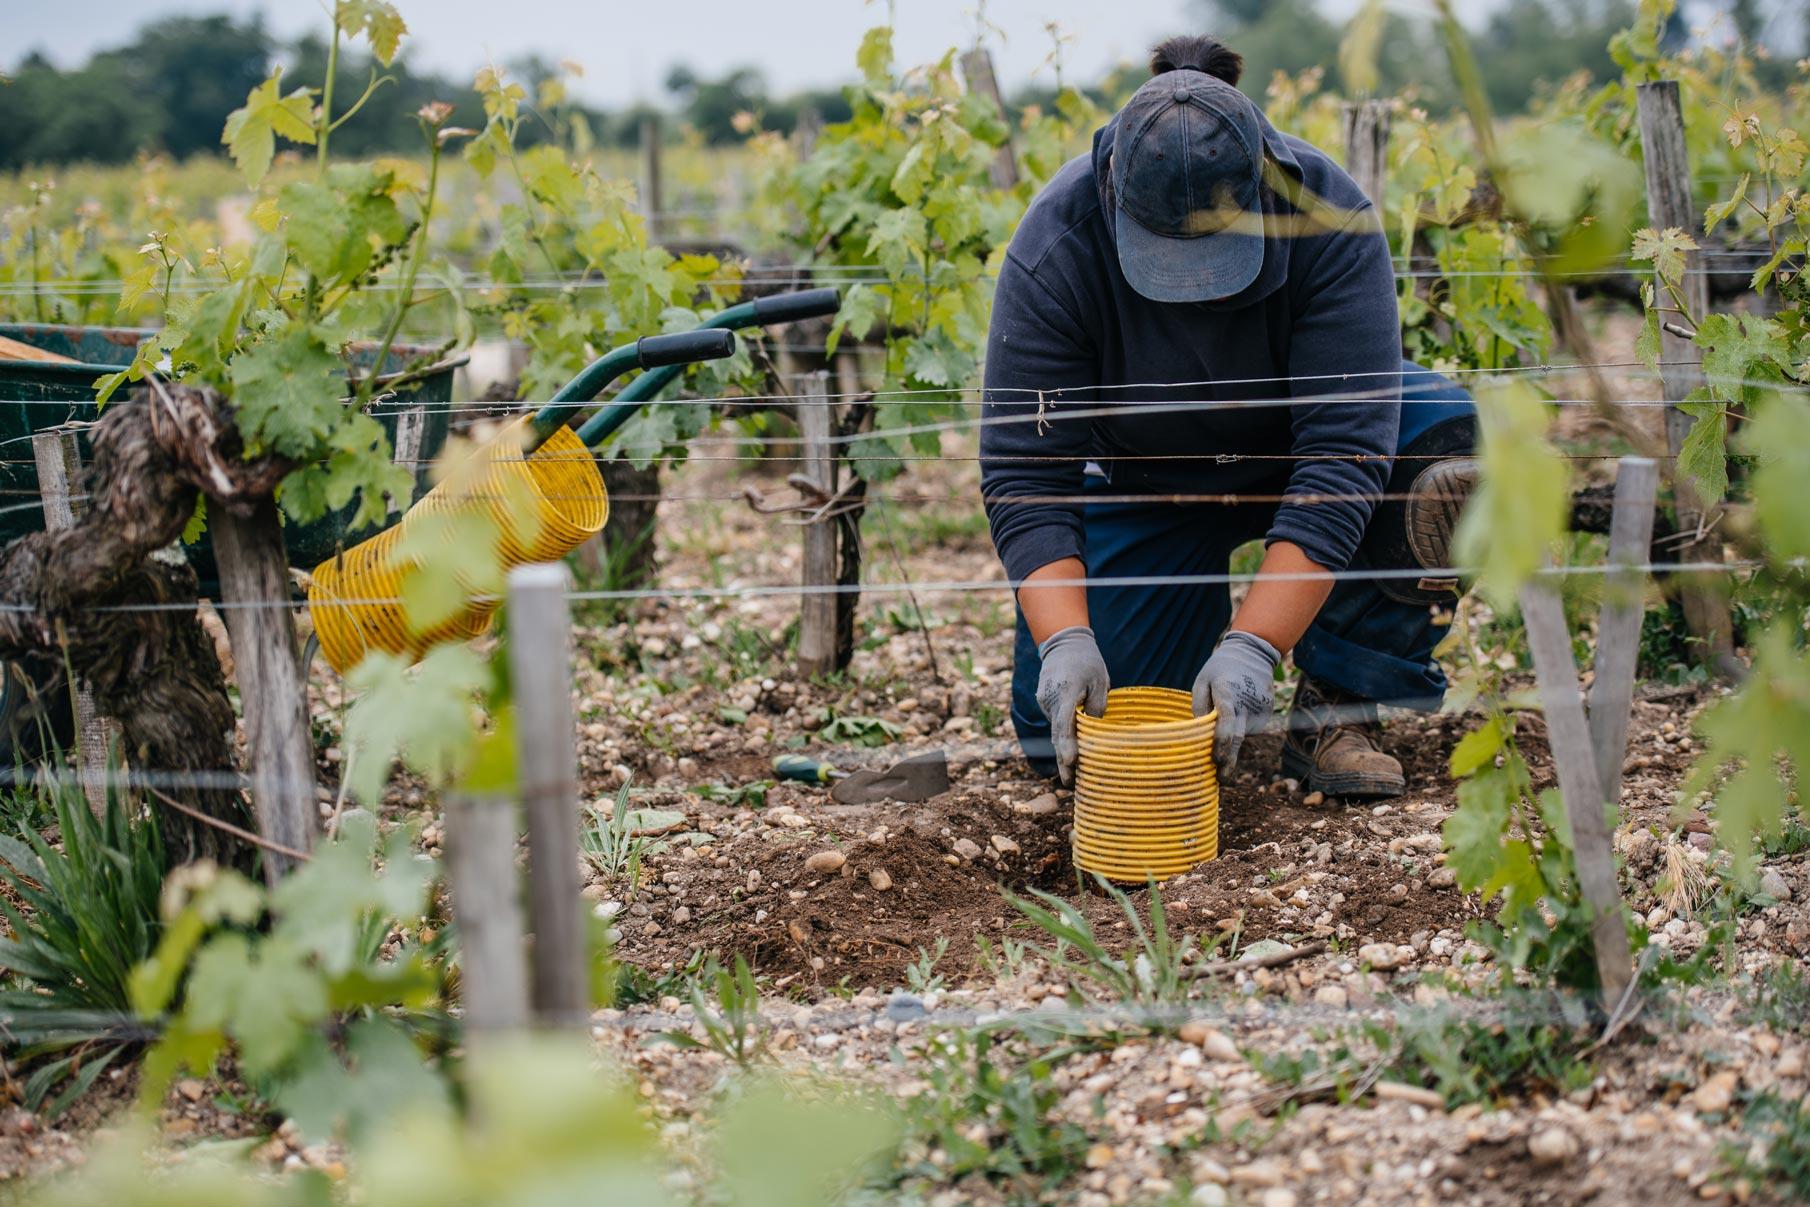 Formazione all'innesto | Château Pontet-Canet | Pauillac | Bordeaux